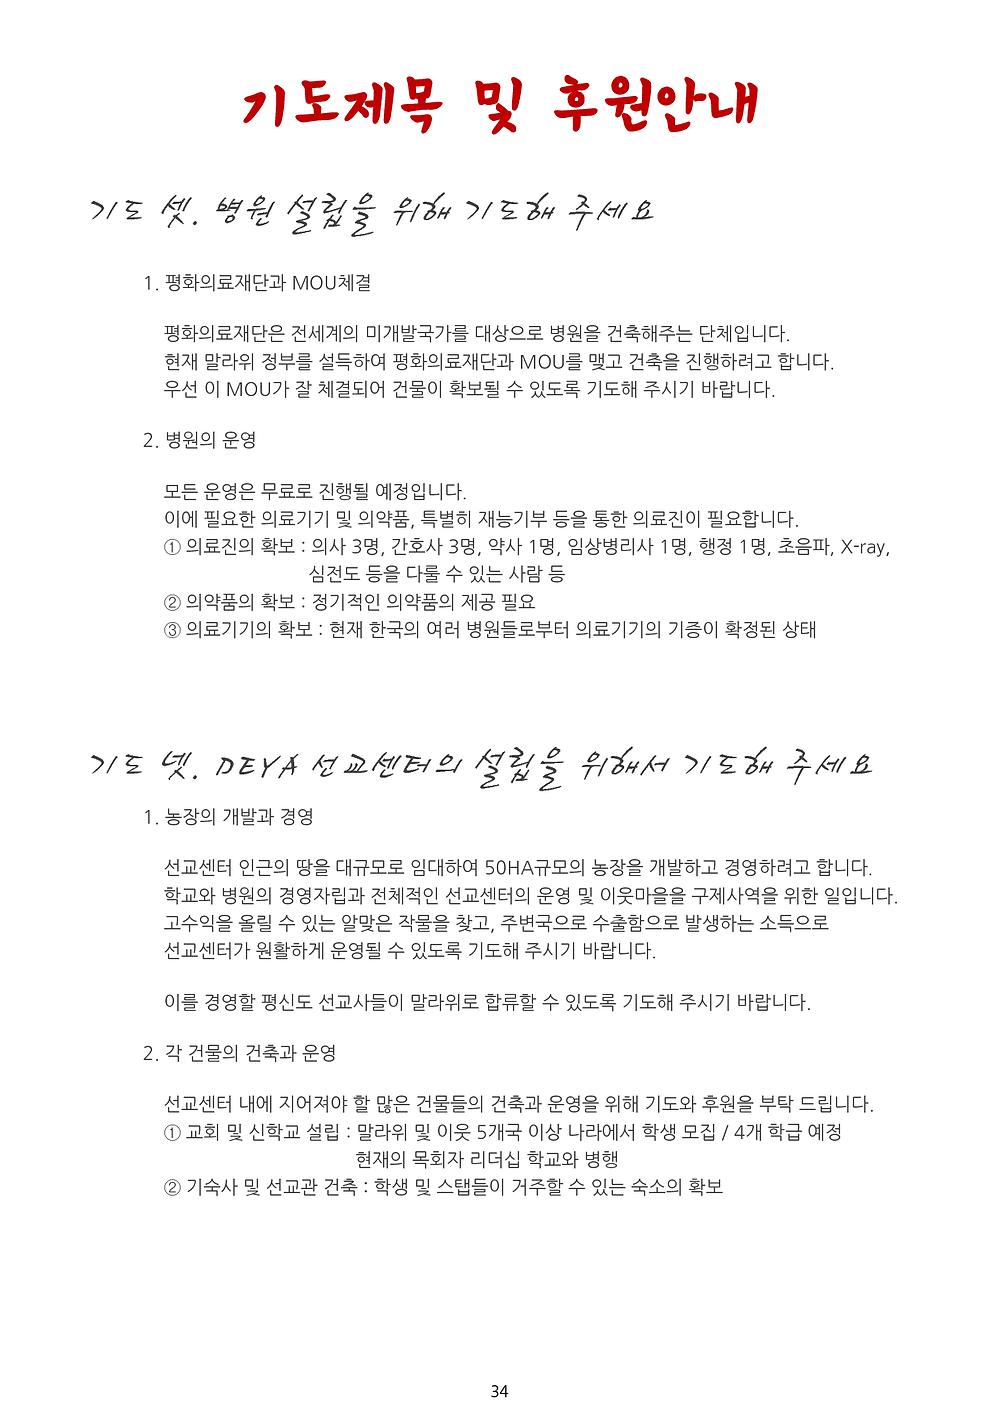 NWM 2014년 선교보고_34.png